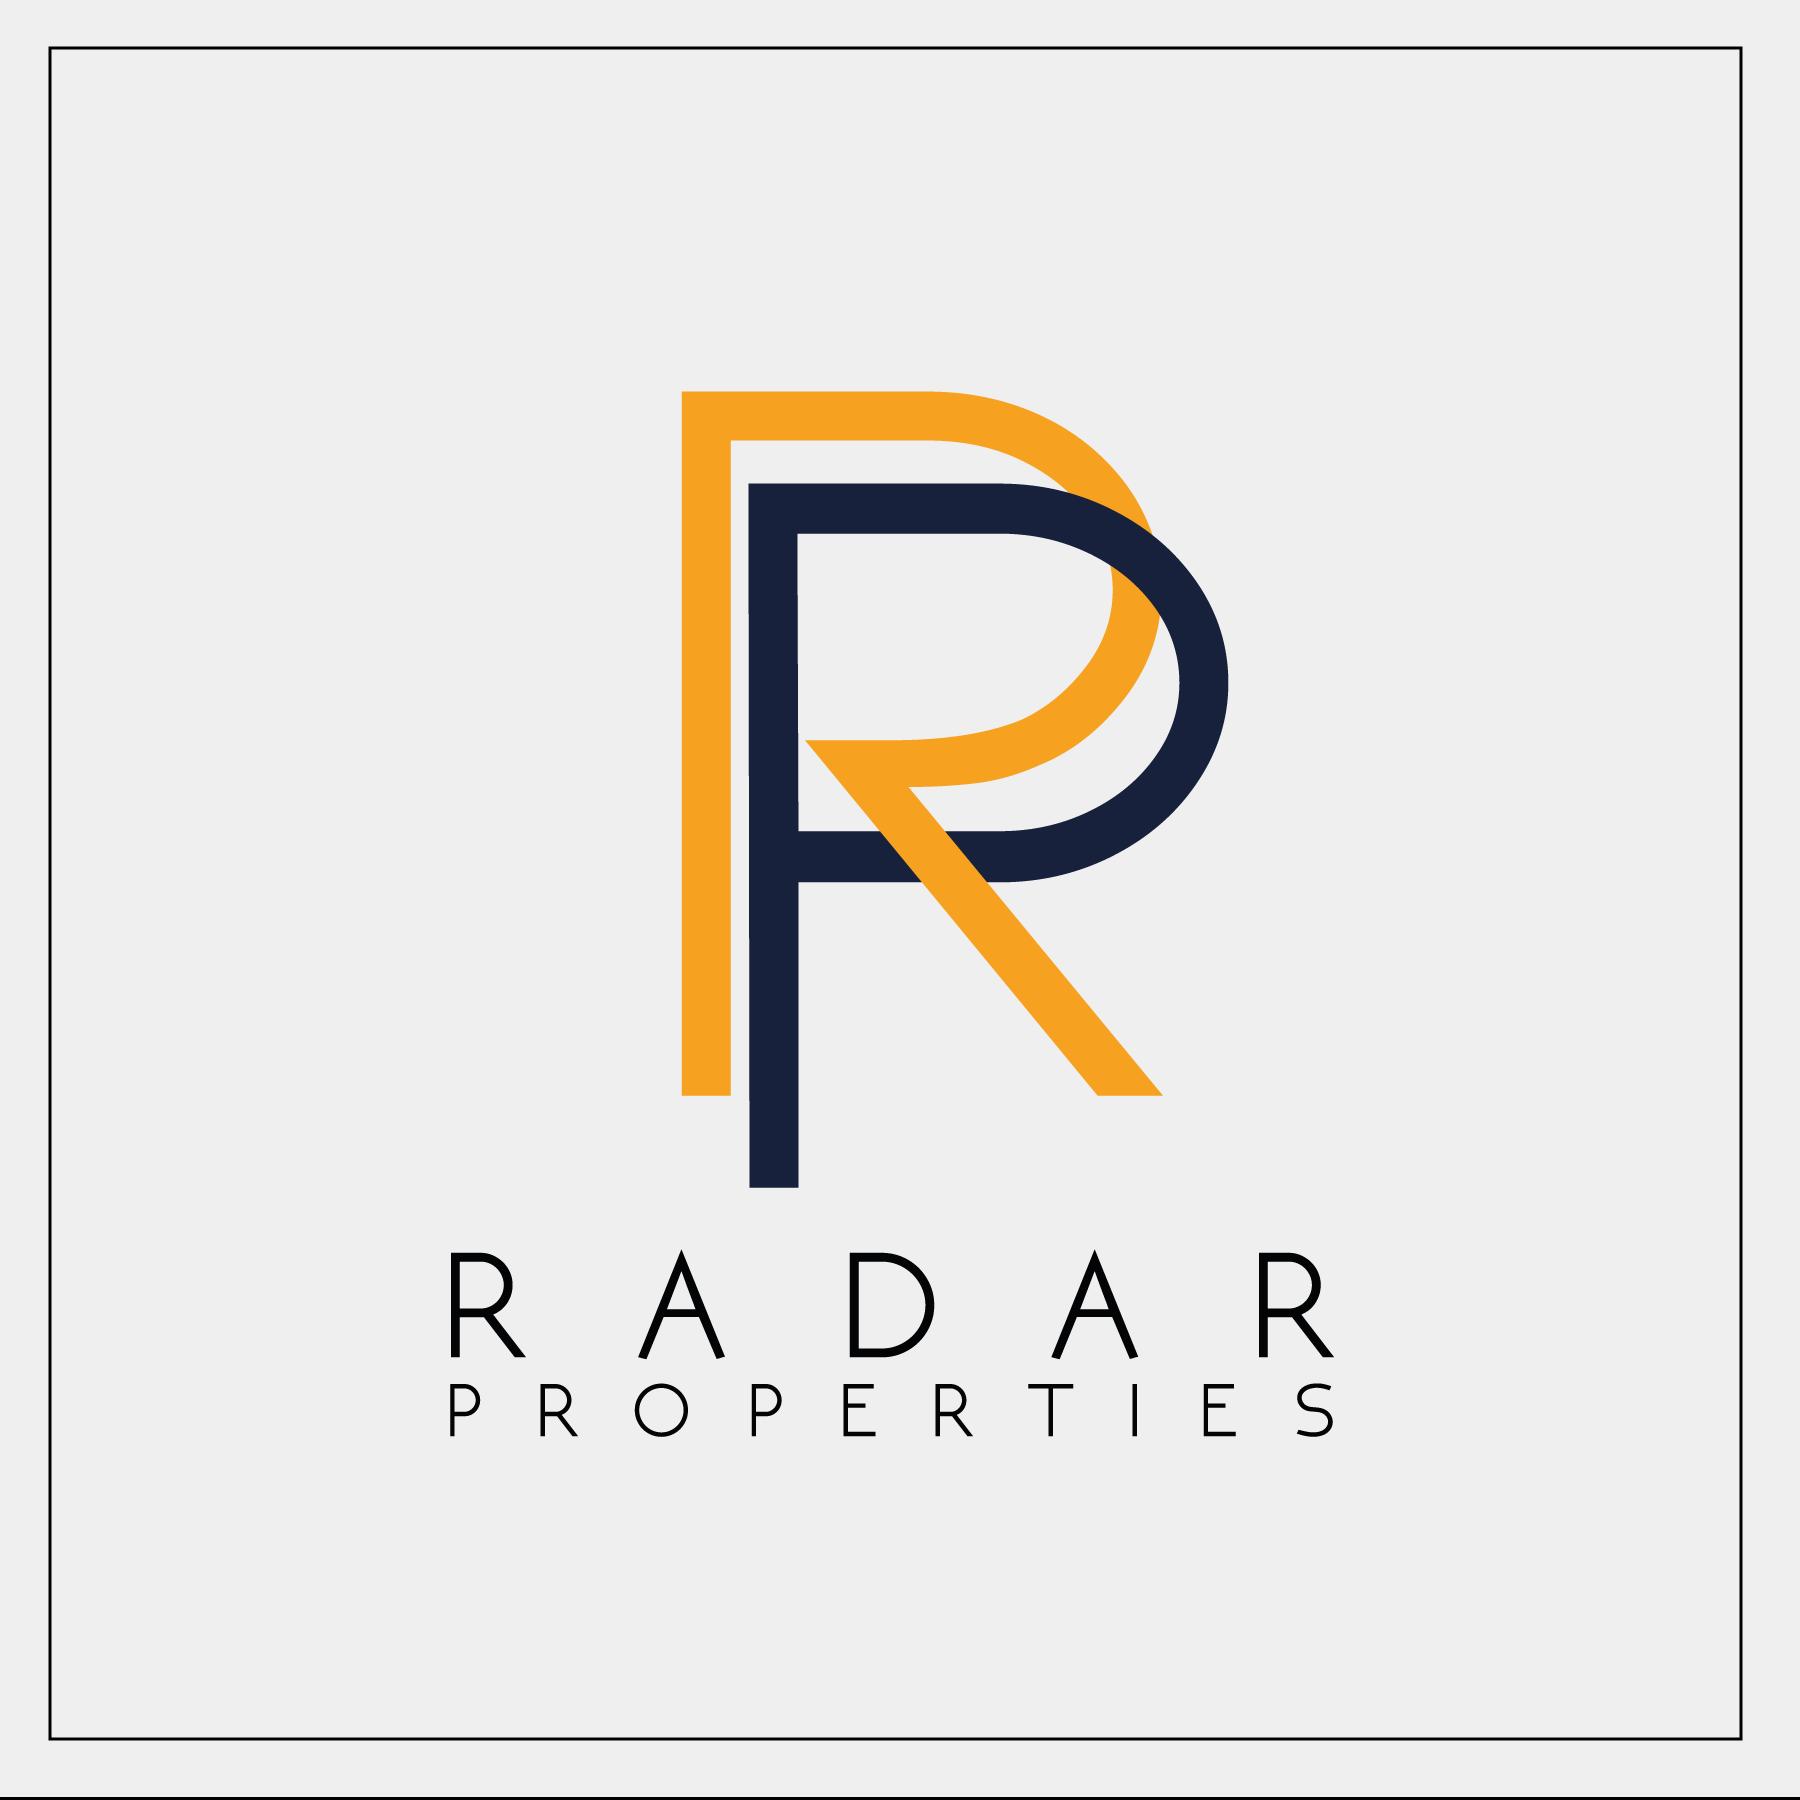 Radar-Properties